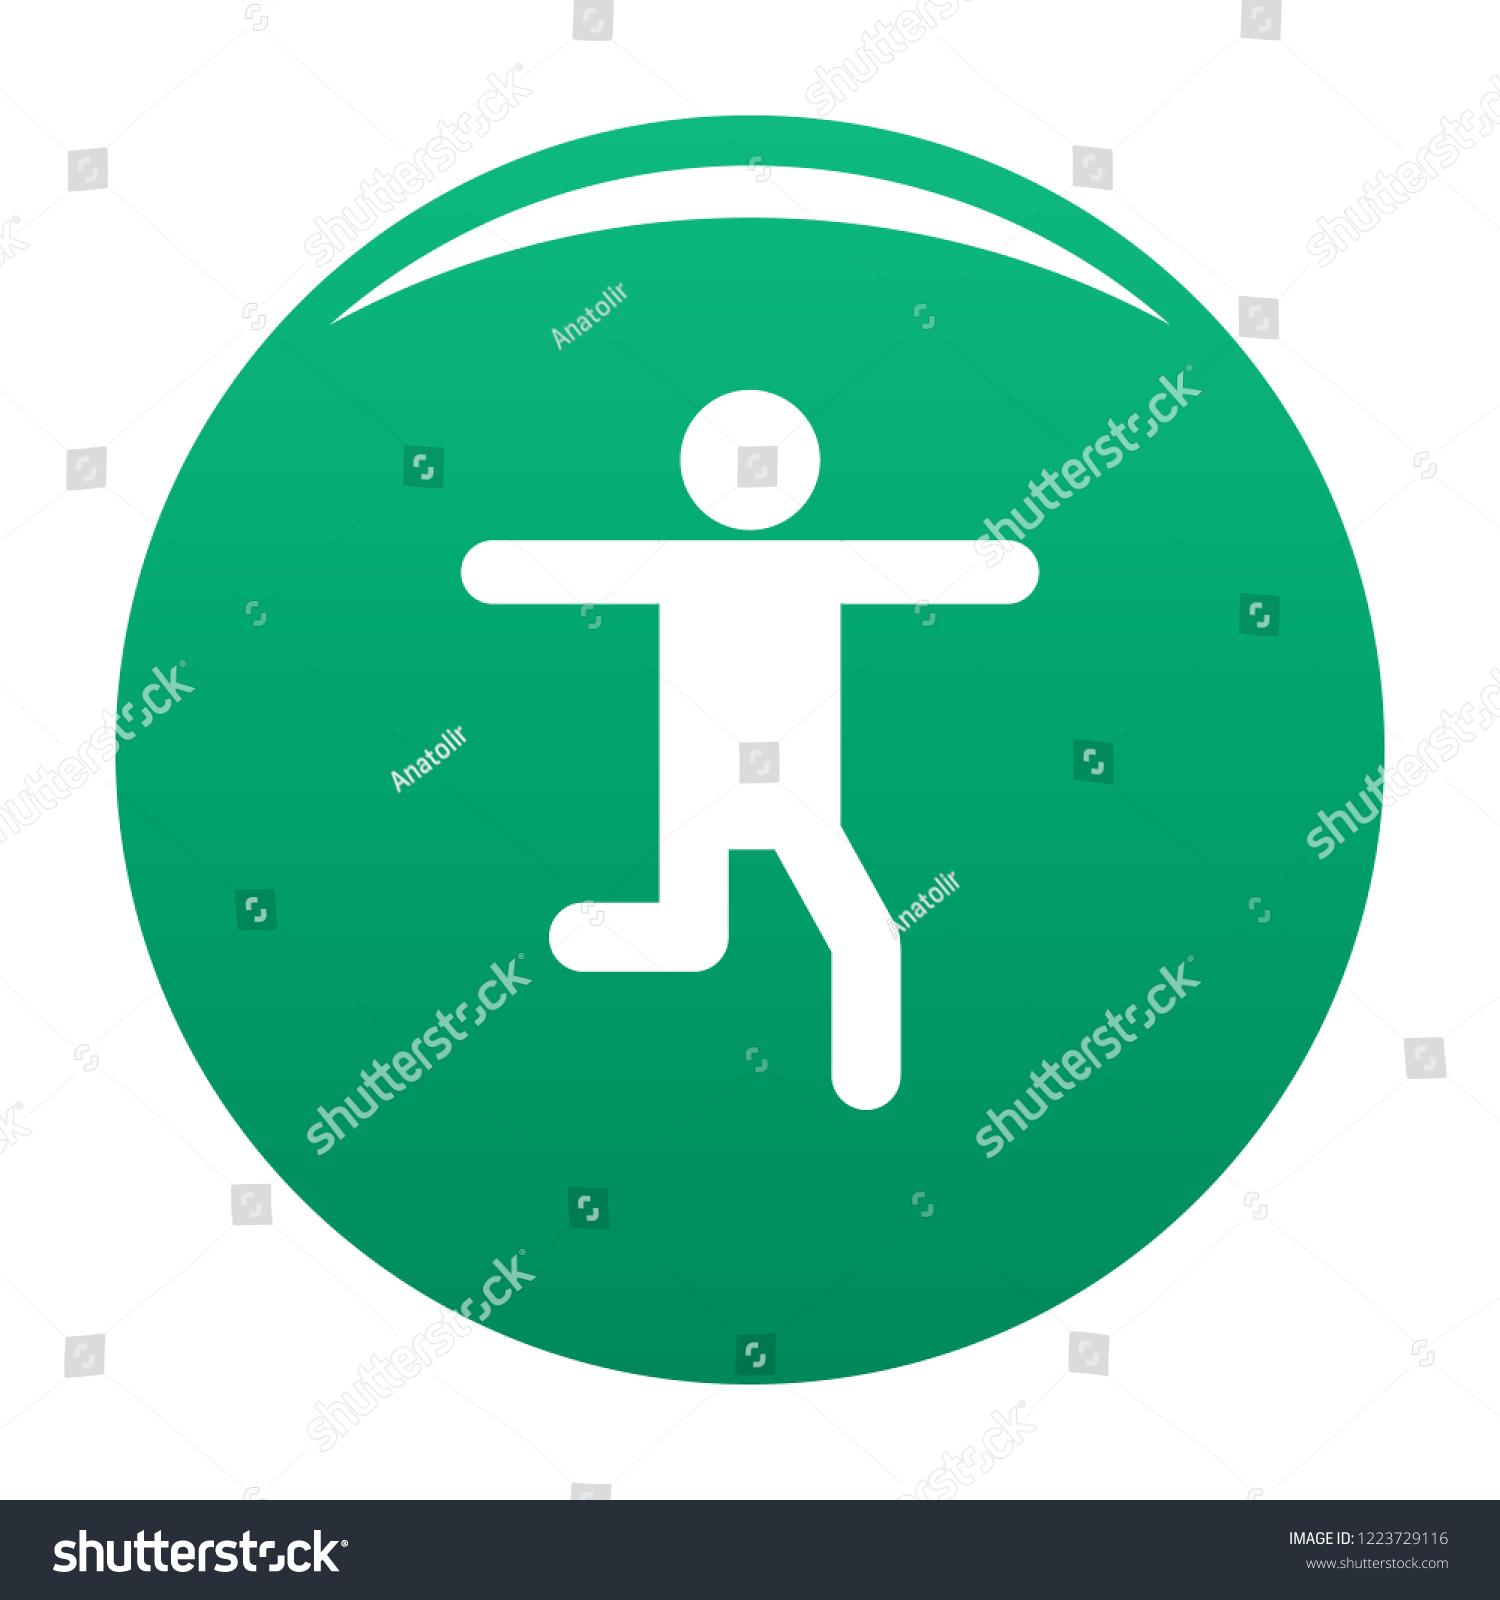 Royalty Free Stock Illustration Of Stick Figure Stickman Icon